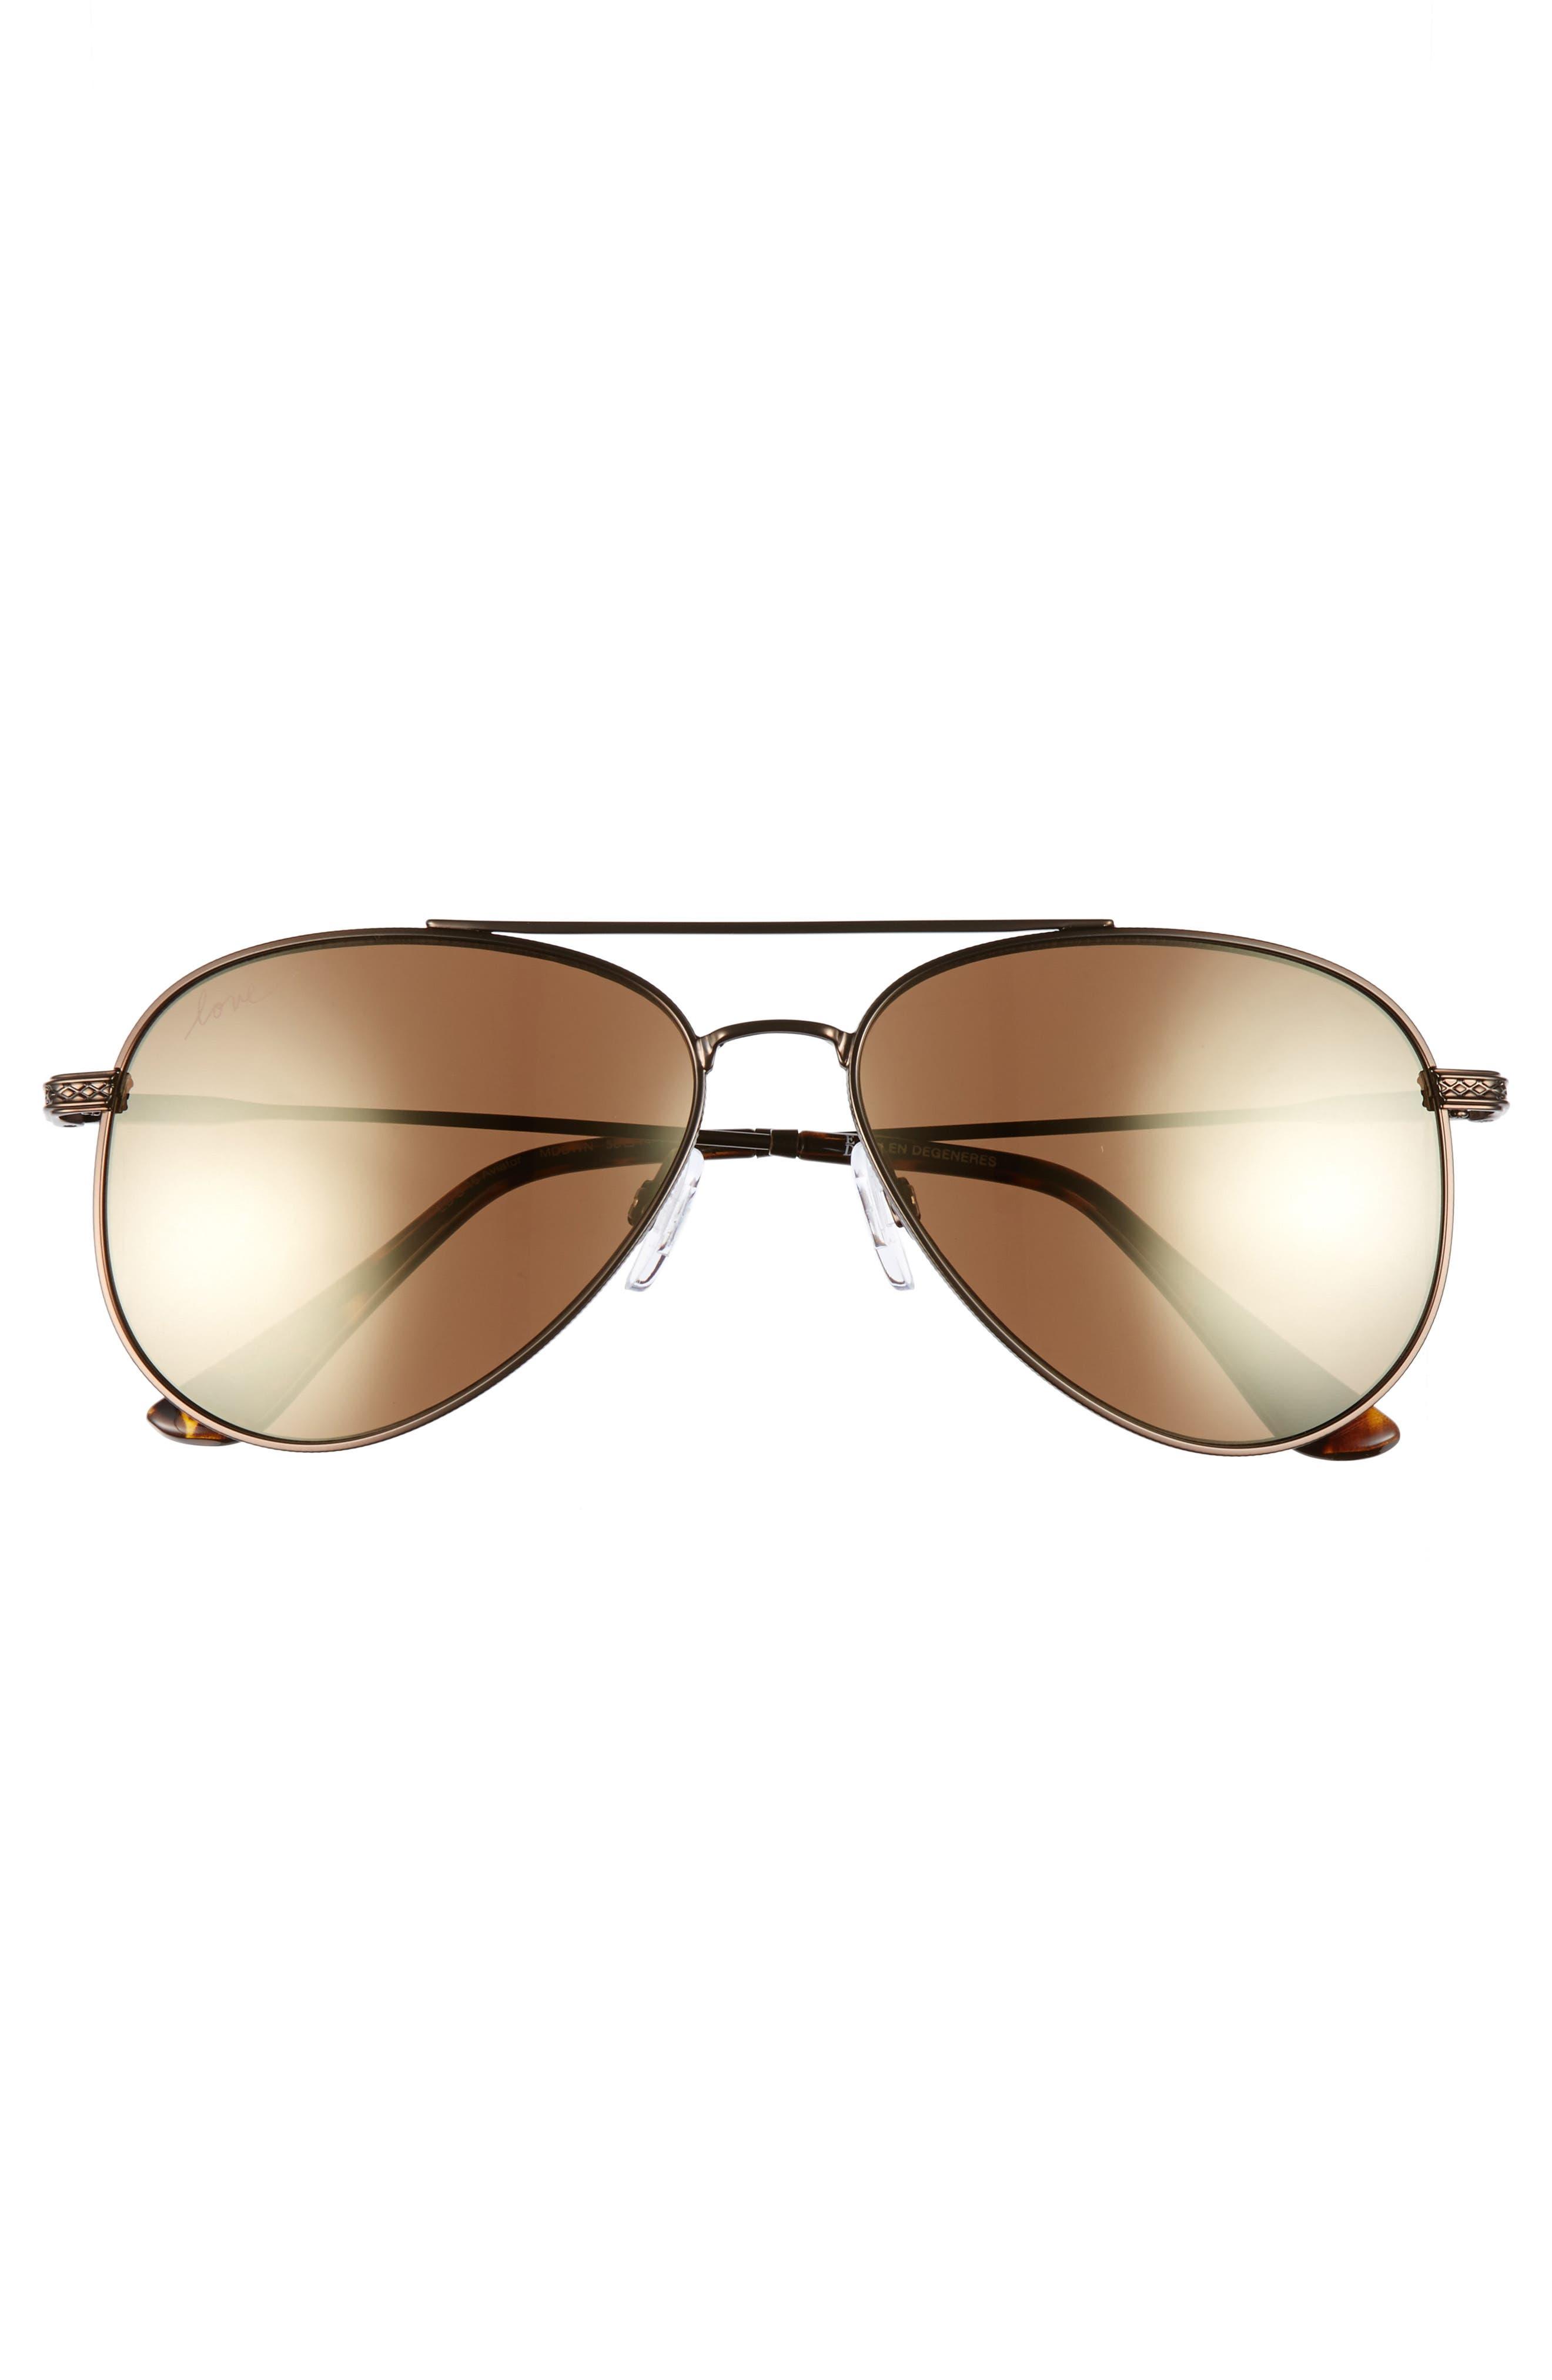 58mm Aviator Sunglasses,                             Alternate thumbnail 8, color,